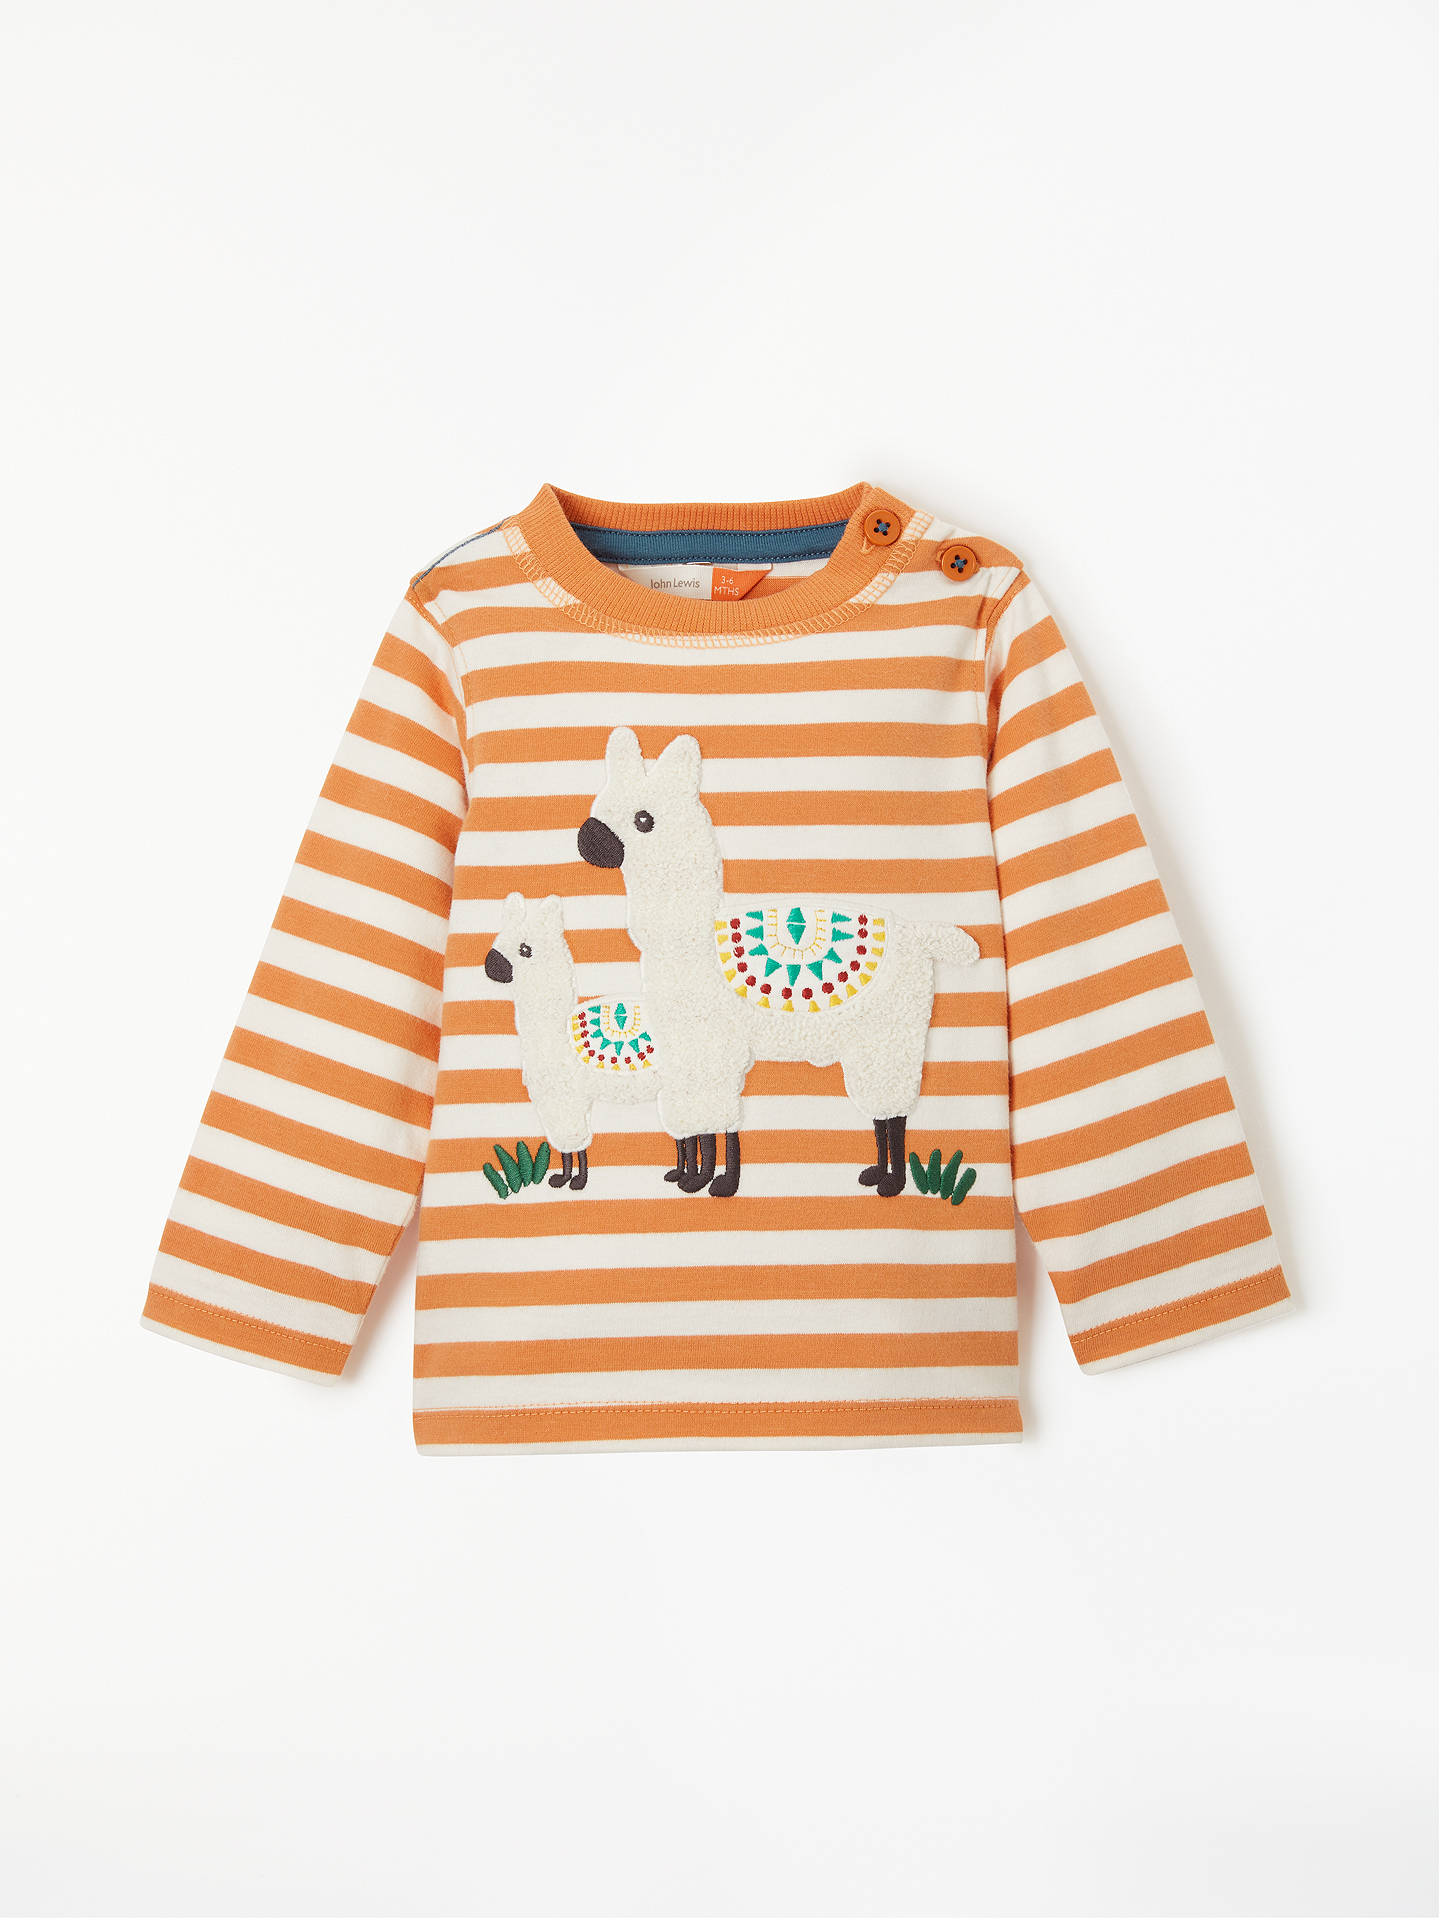 36c687c73a93 John Lewis   Partners Baby Llama T-Shirt